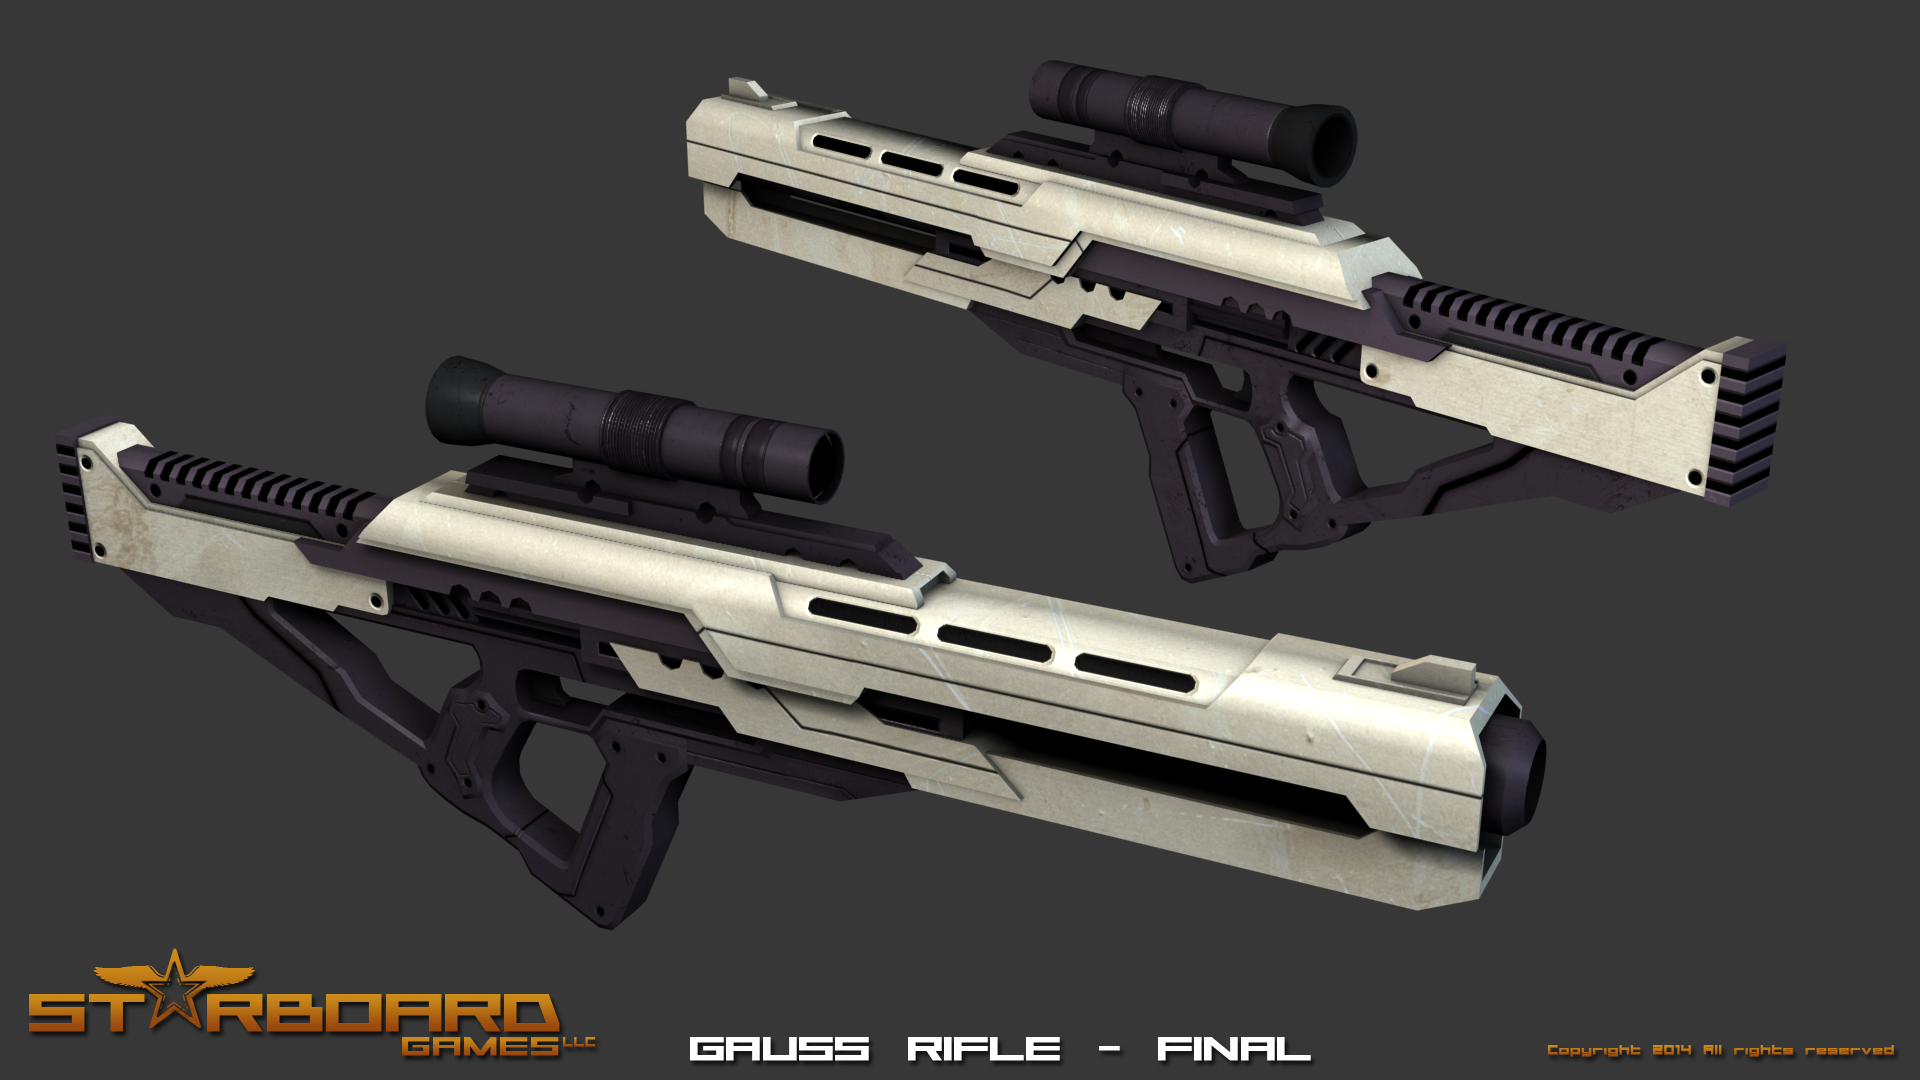 ARS Gauss Rifle